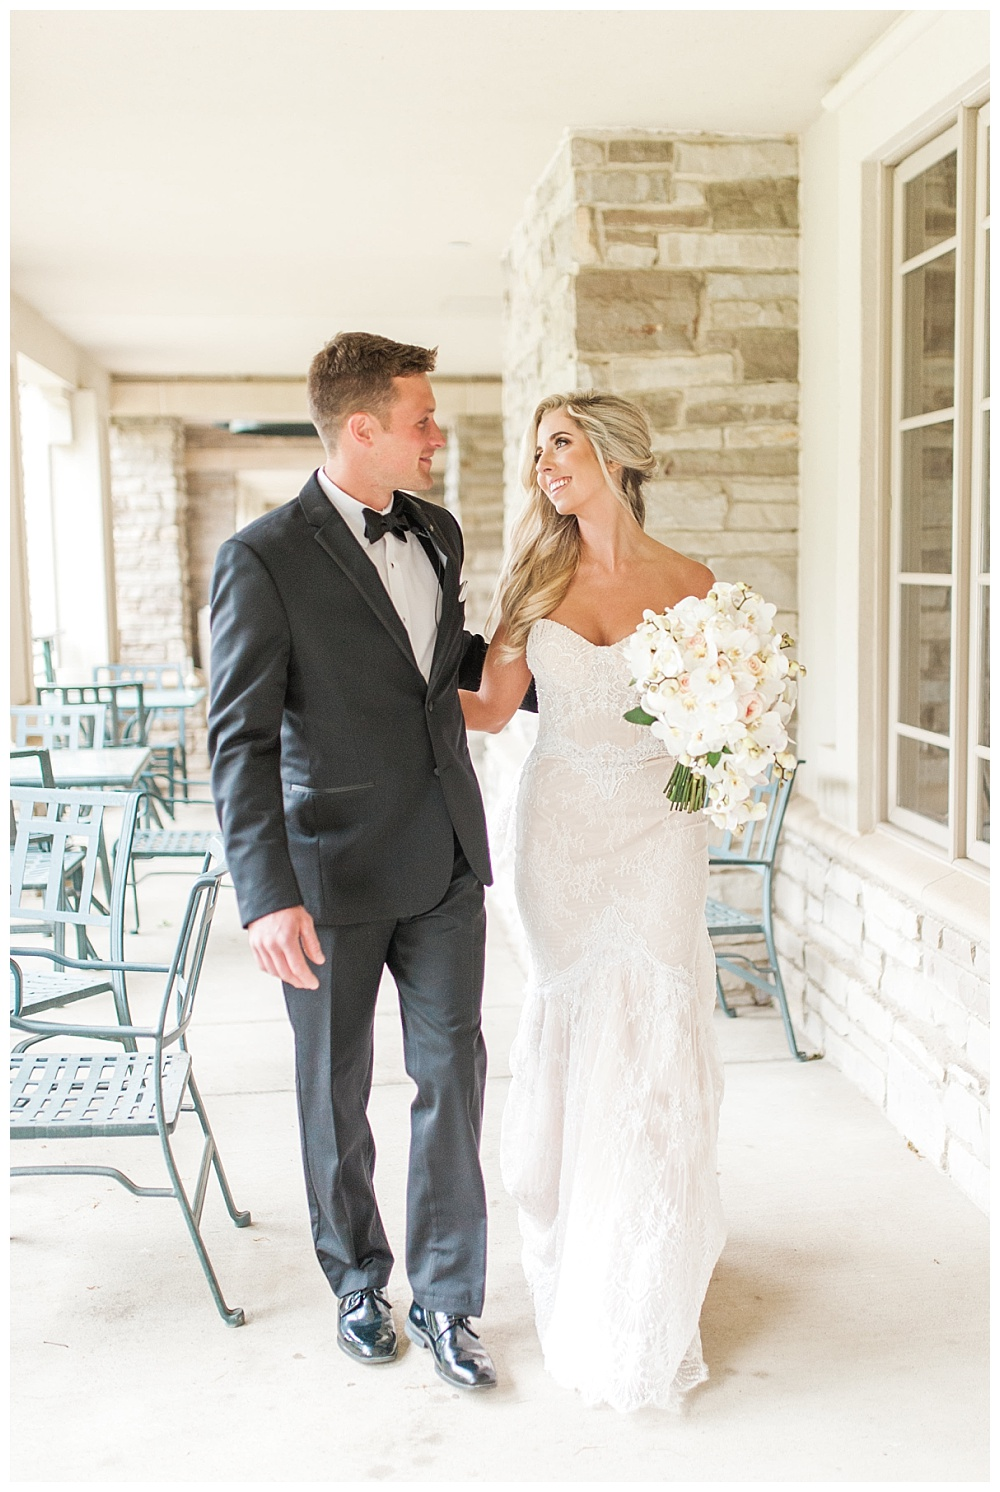 Stephanie Marie Photography TPC Deere Run Quad Cities Iowa City Wedding Photographer Ben Erin Dittmer_0027.jpg